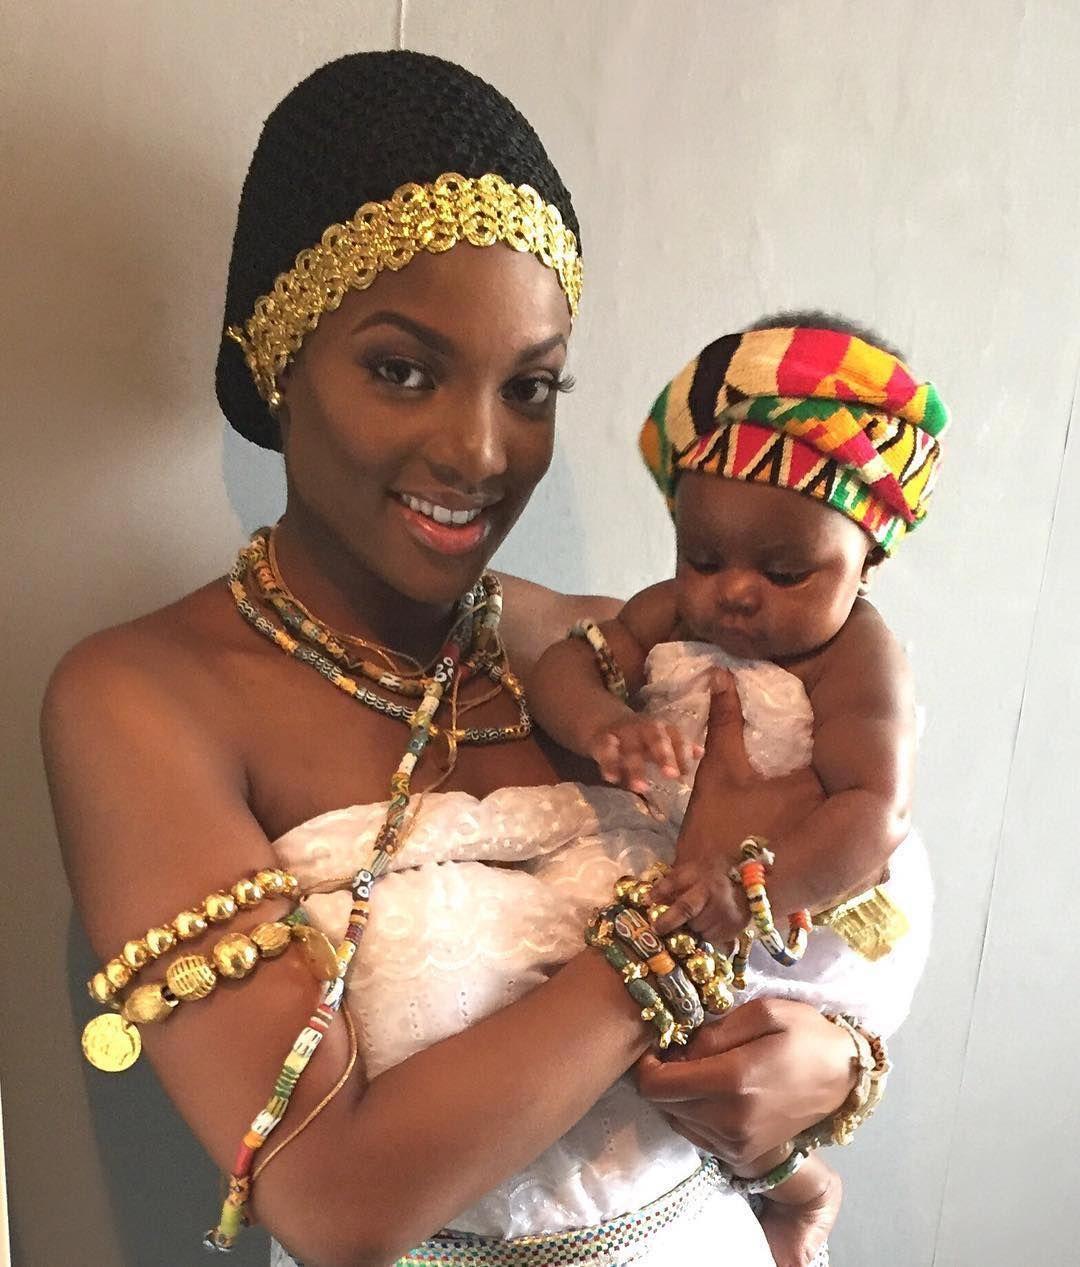 Greetings From Ghana Autres Pinterest Ghana And Instagram